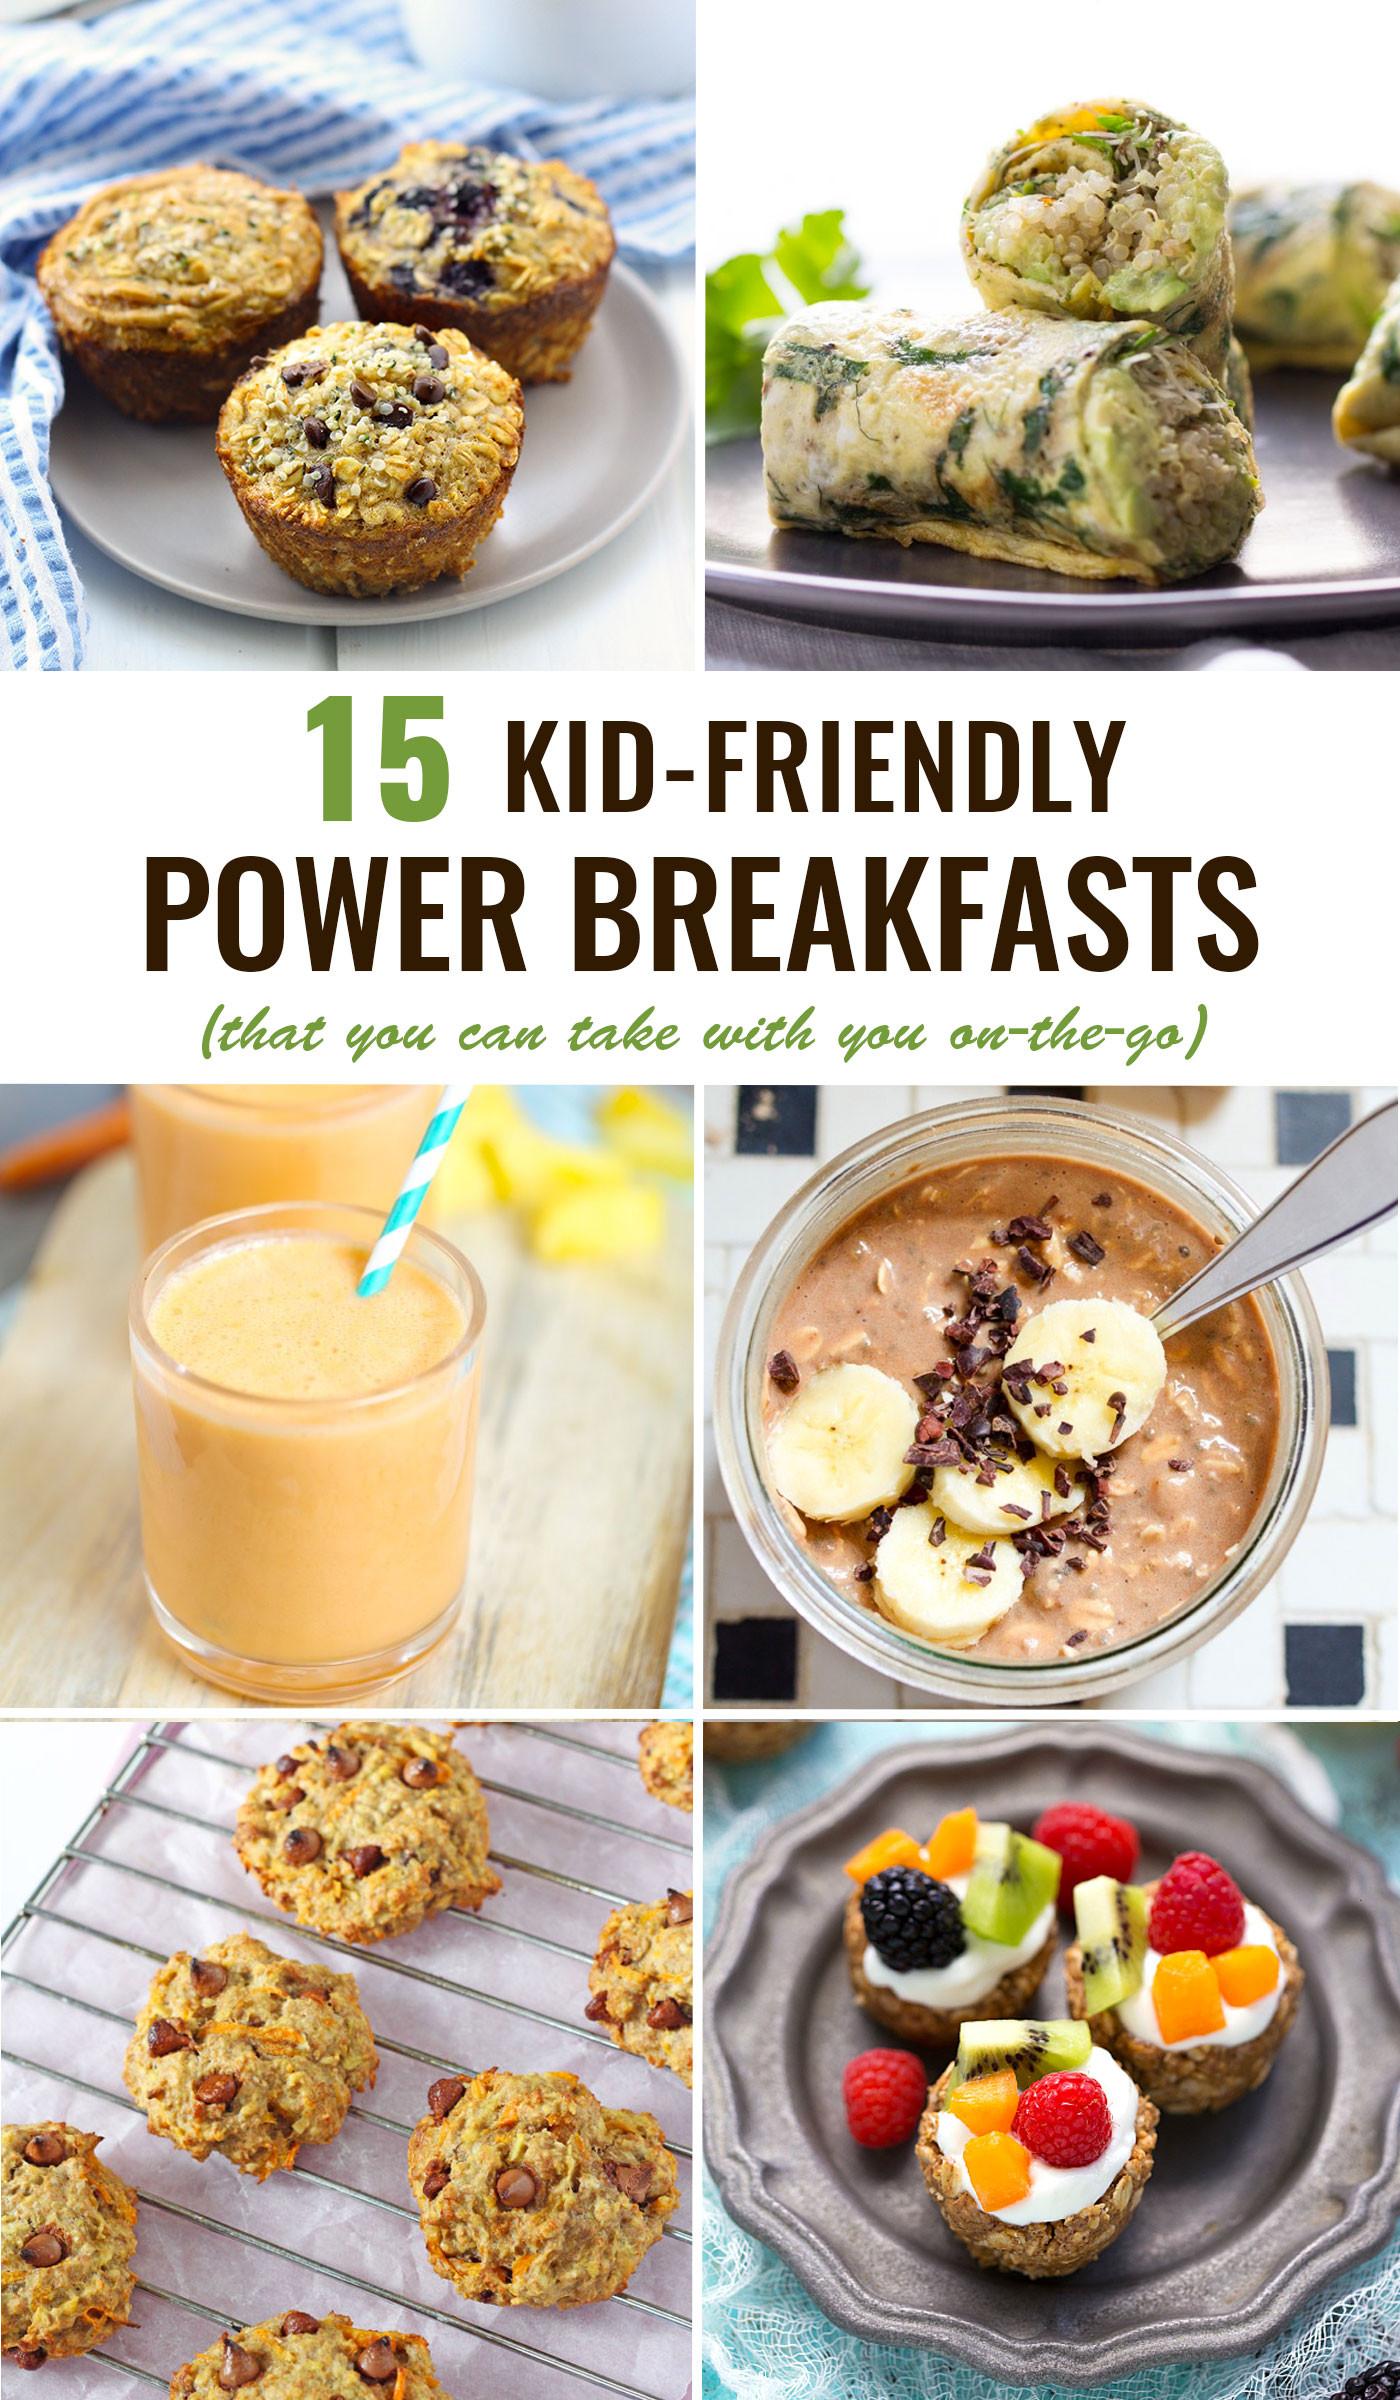 Healthy Breakfast Options On The Go  Kid Friendly Power Breakfasts To Go